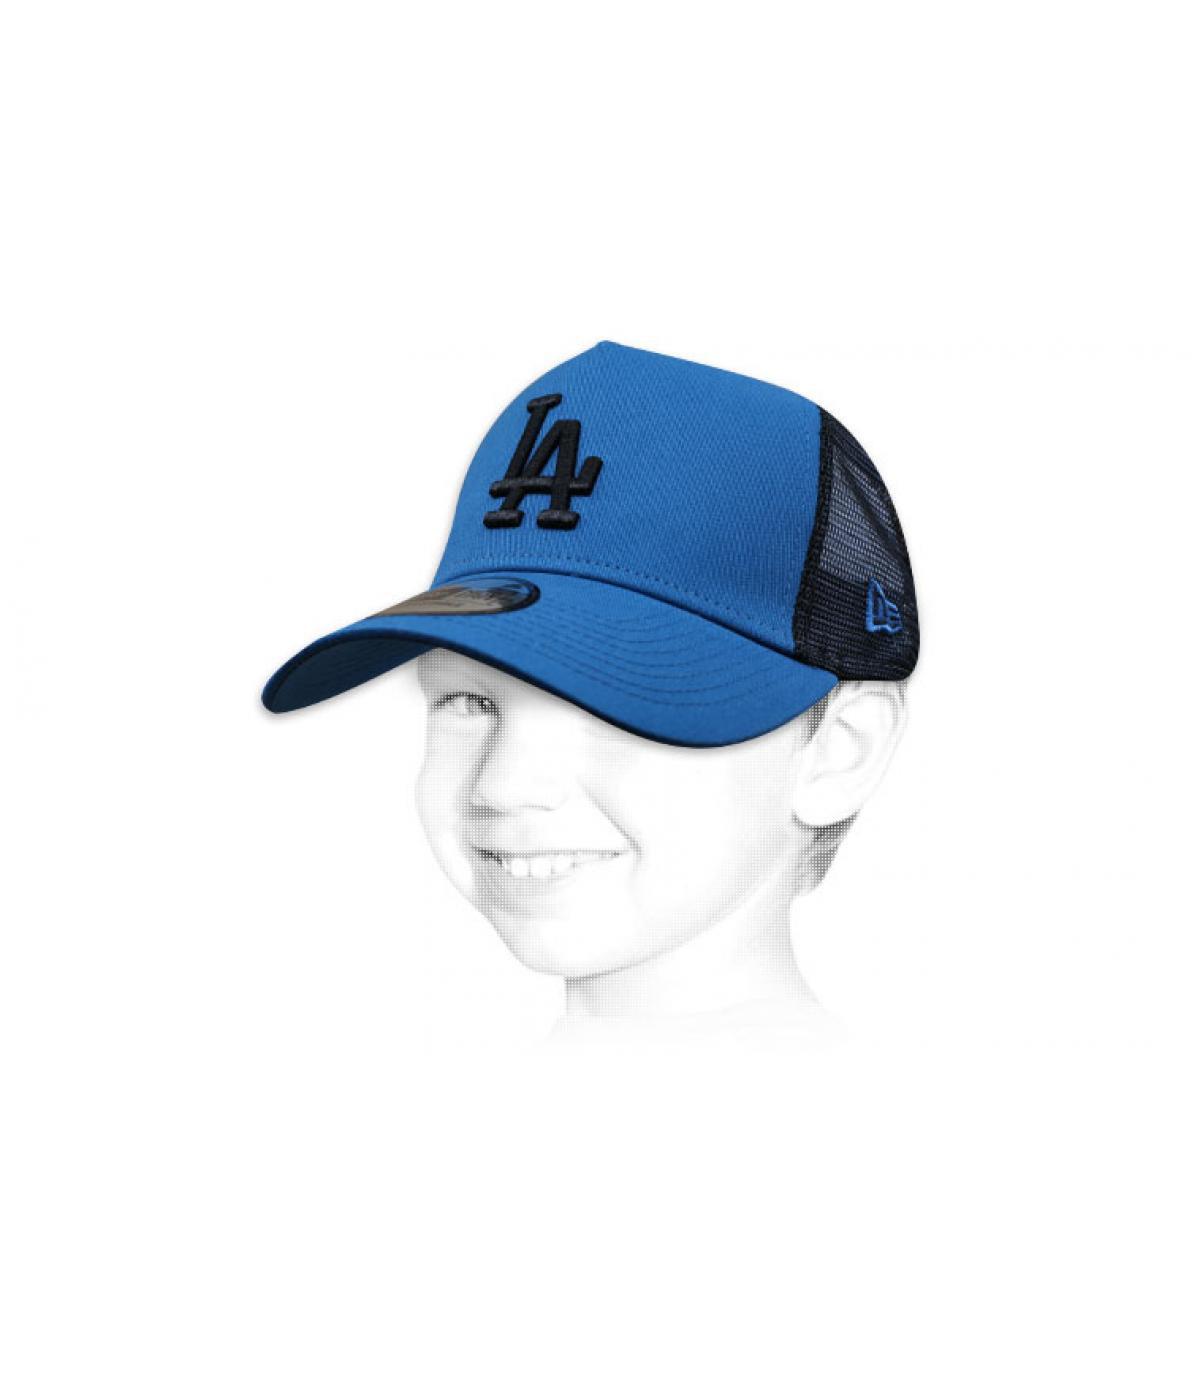 Kinder Trucker Cap blau LA